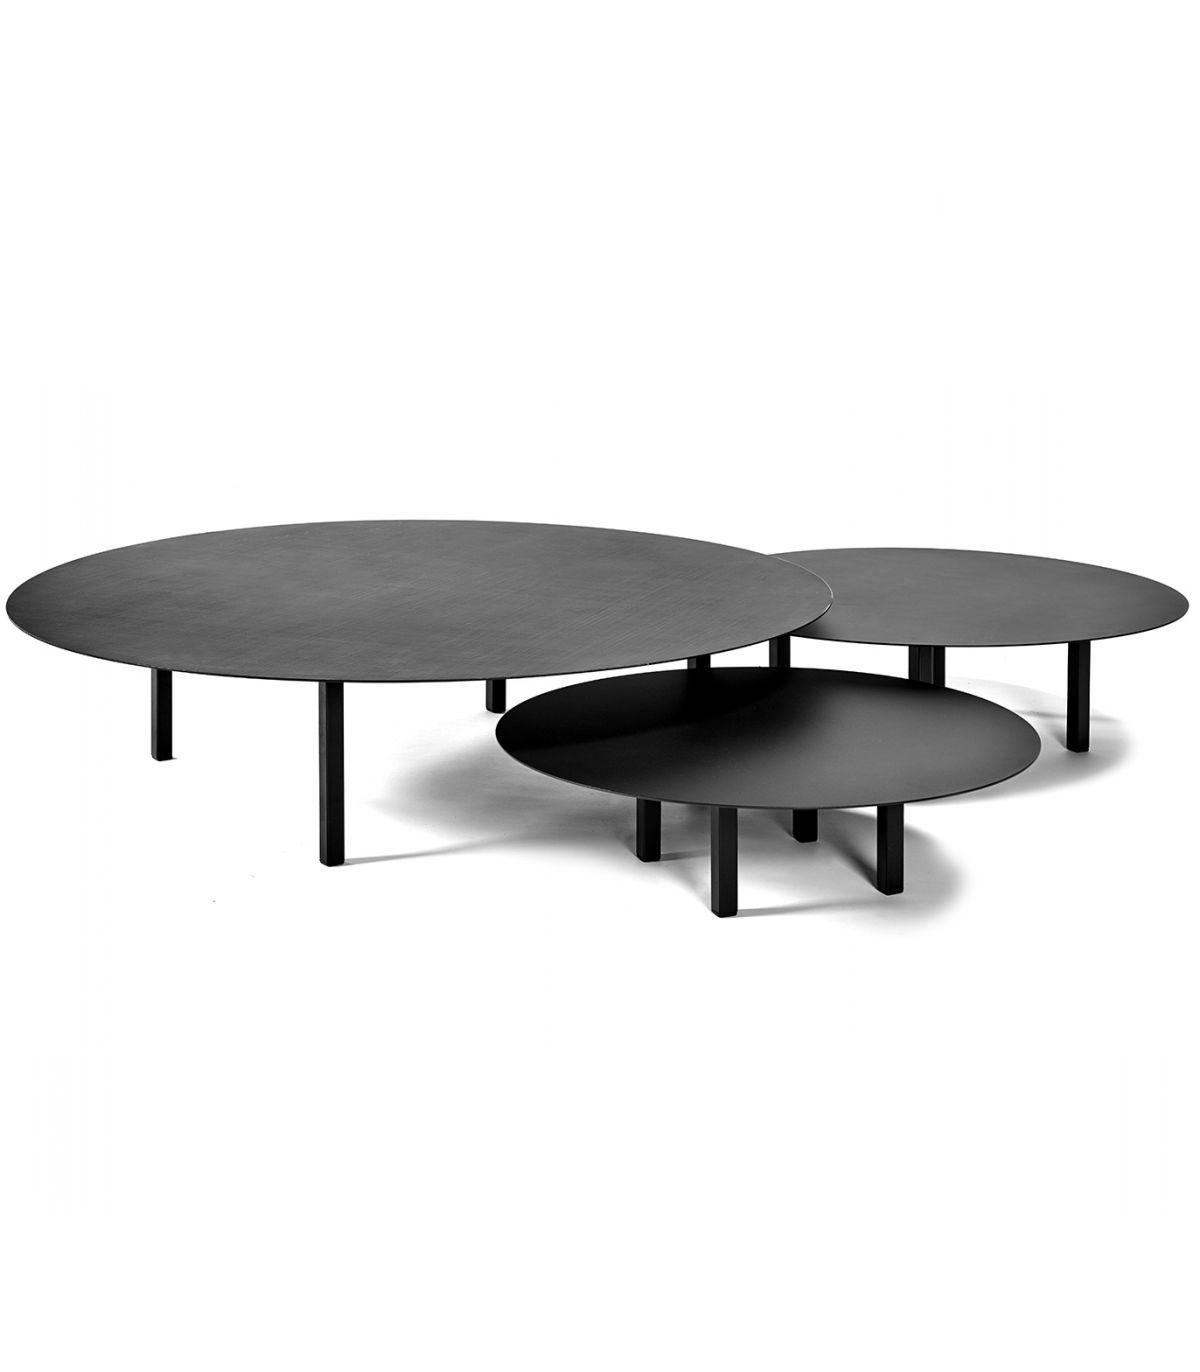 Table basse ronde métal noir Serax Mesure S